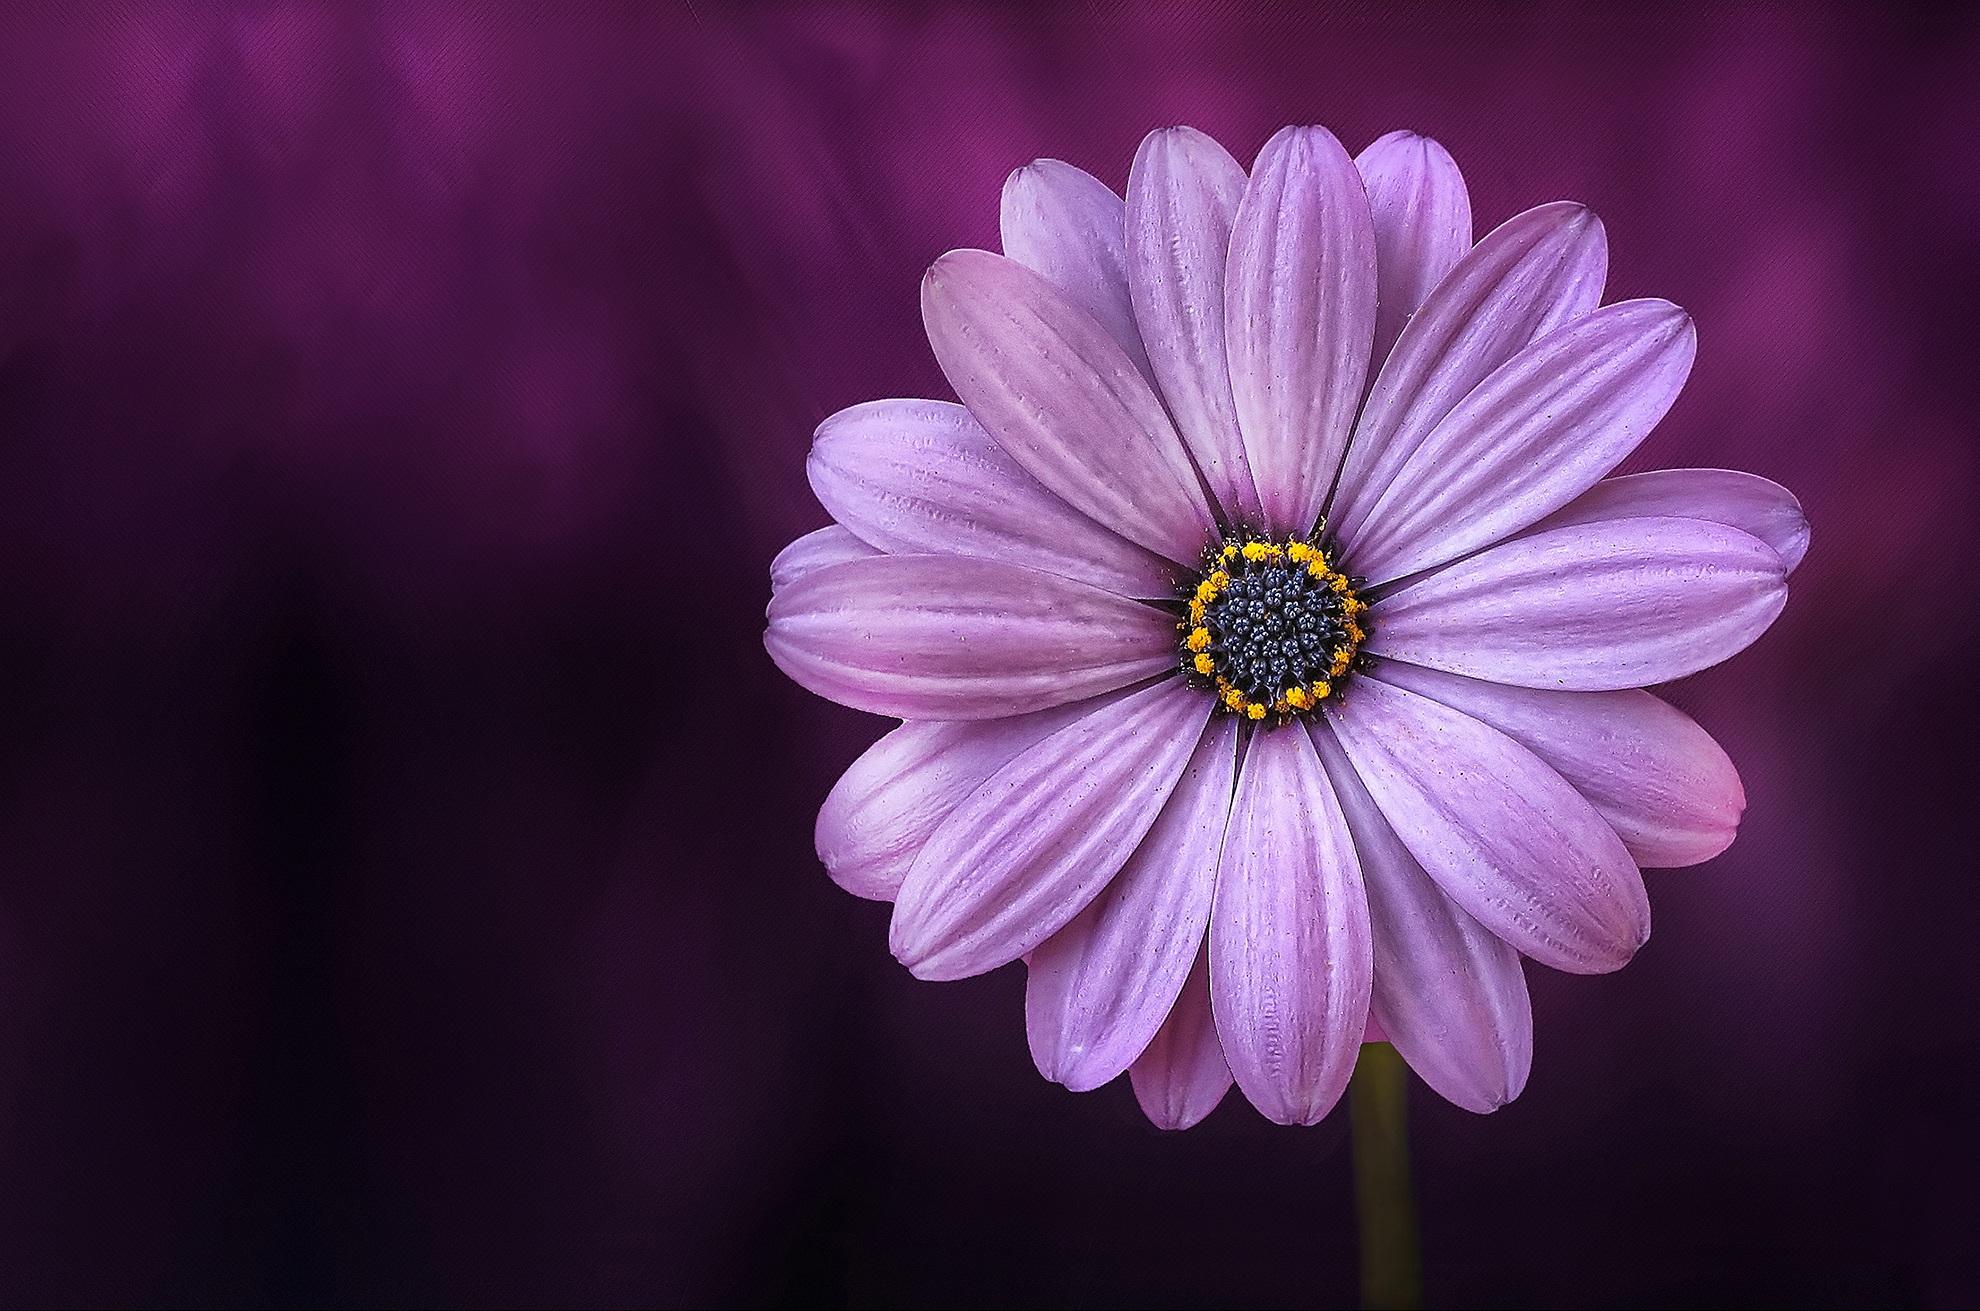 flower-purple-lical-blosso